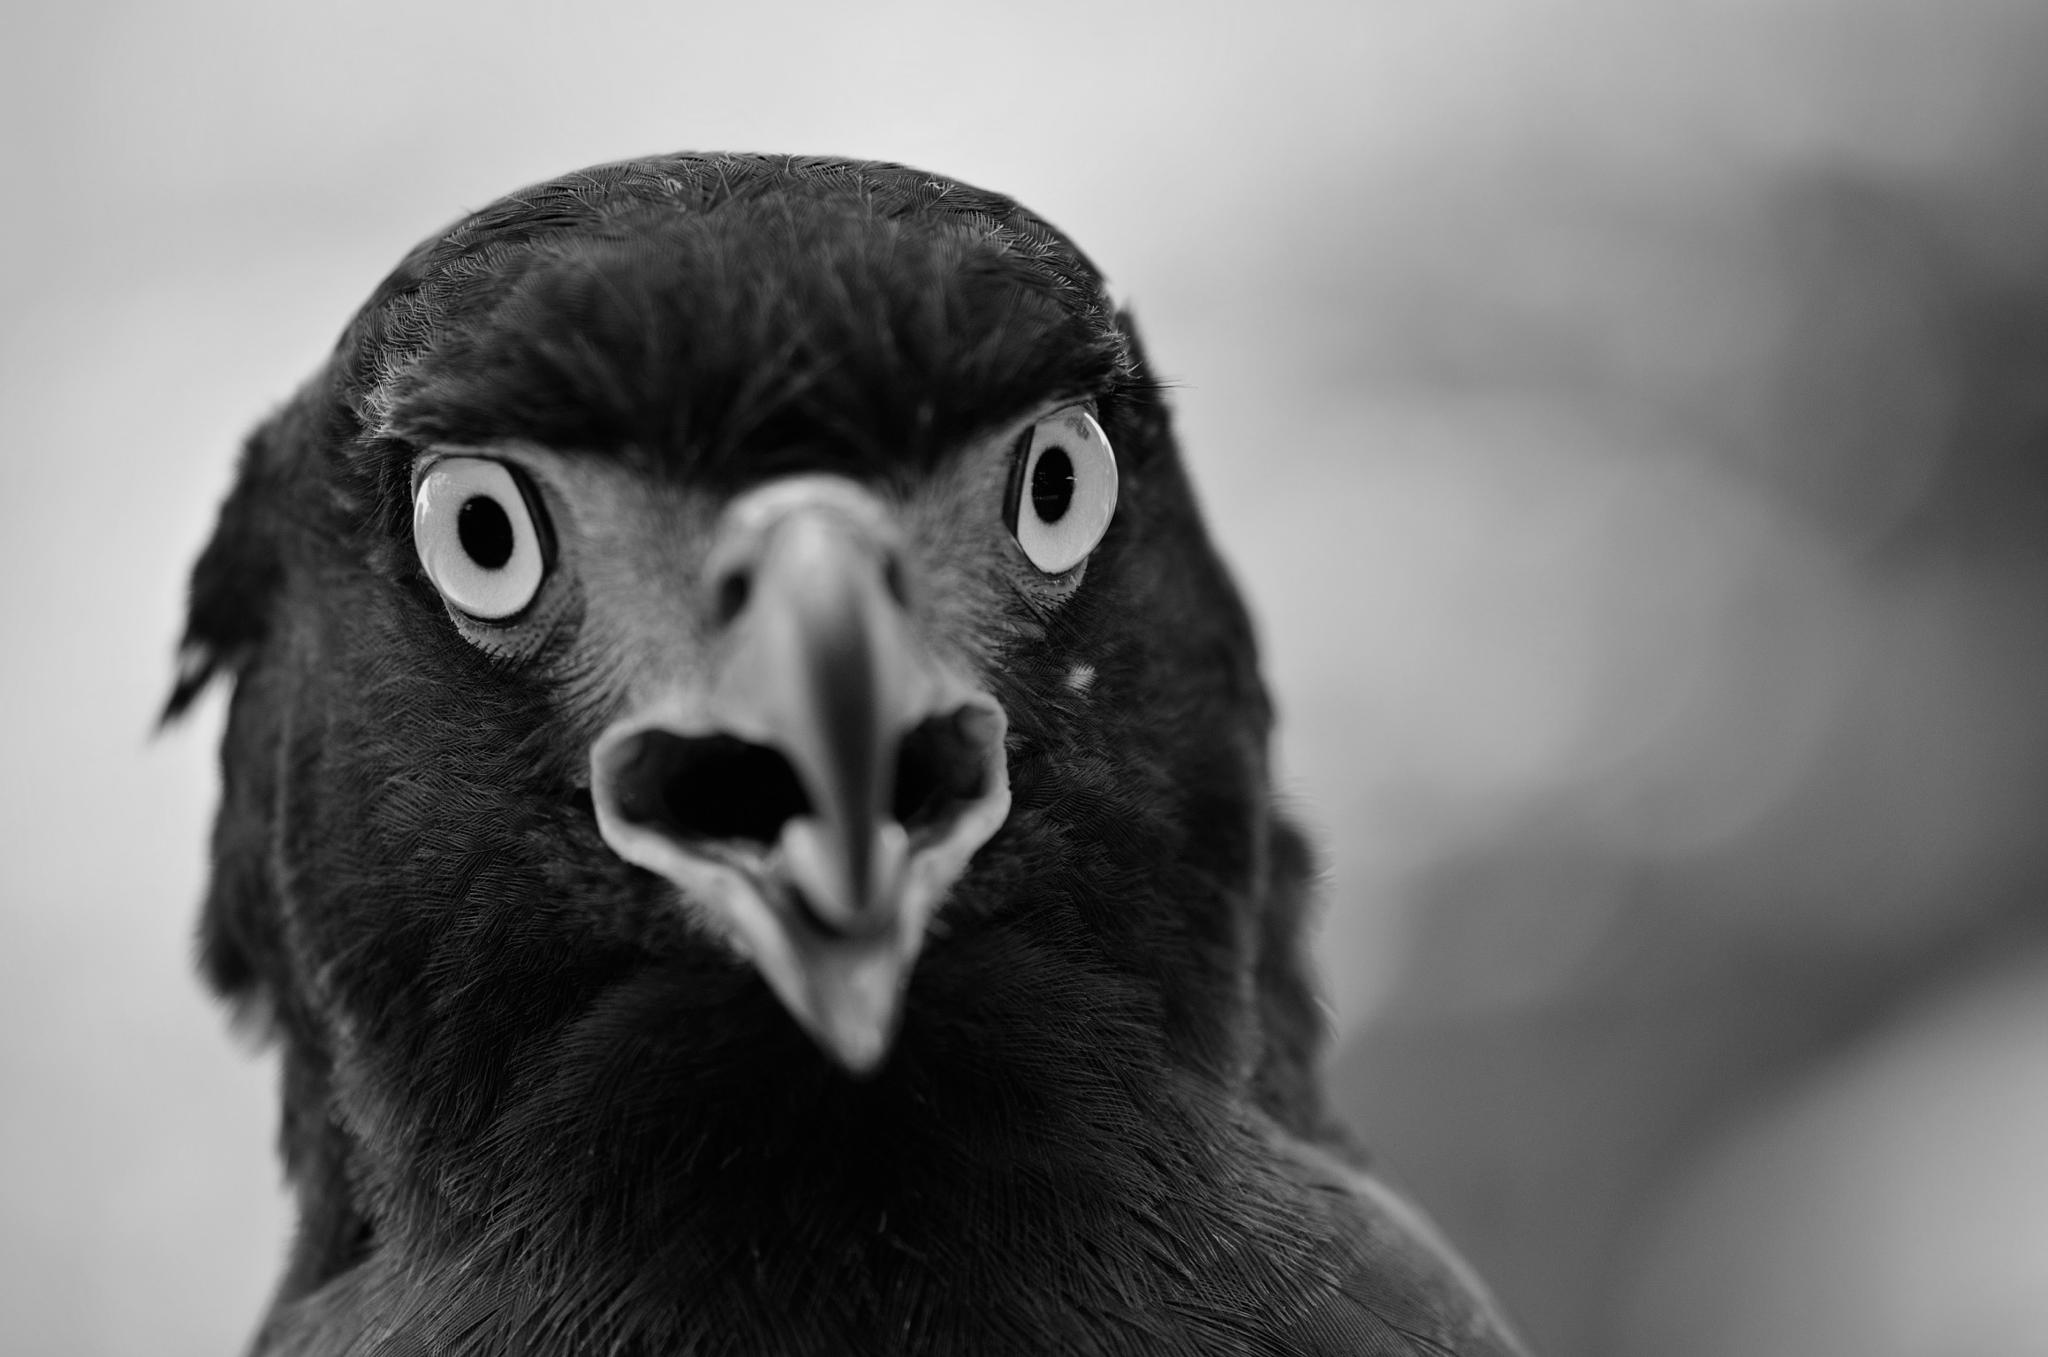 Eagle BW by Yulius